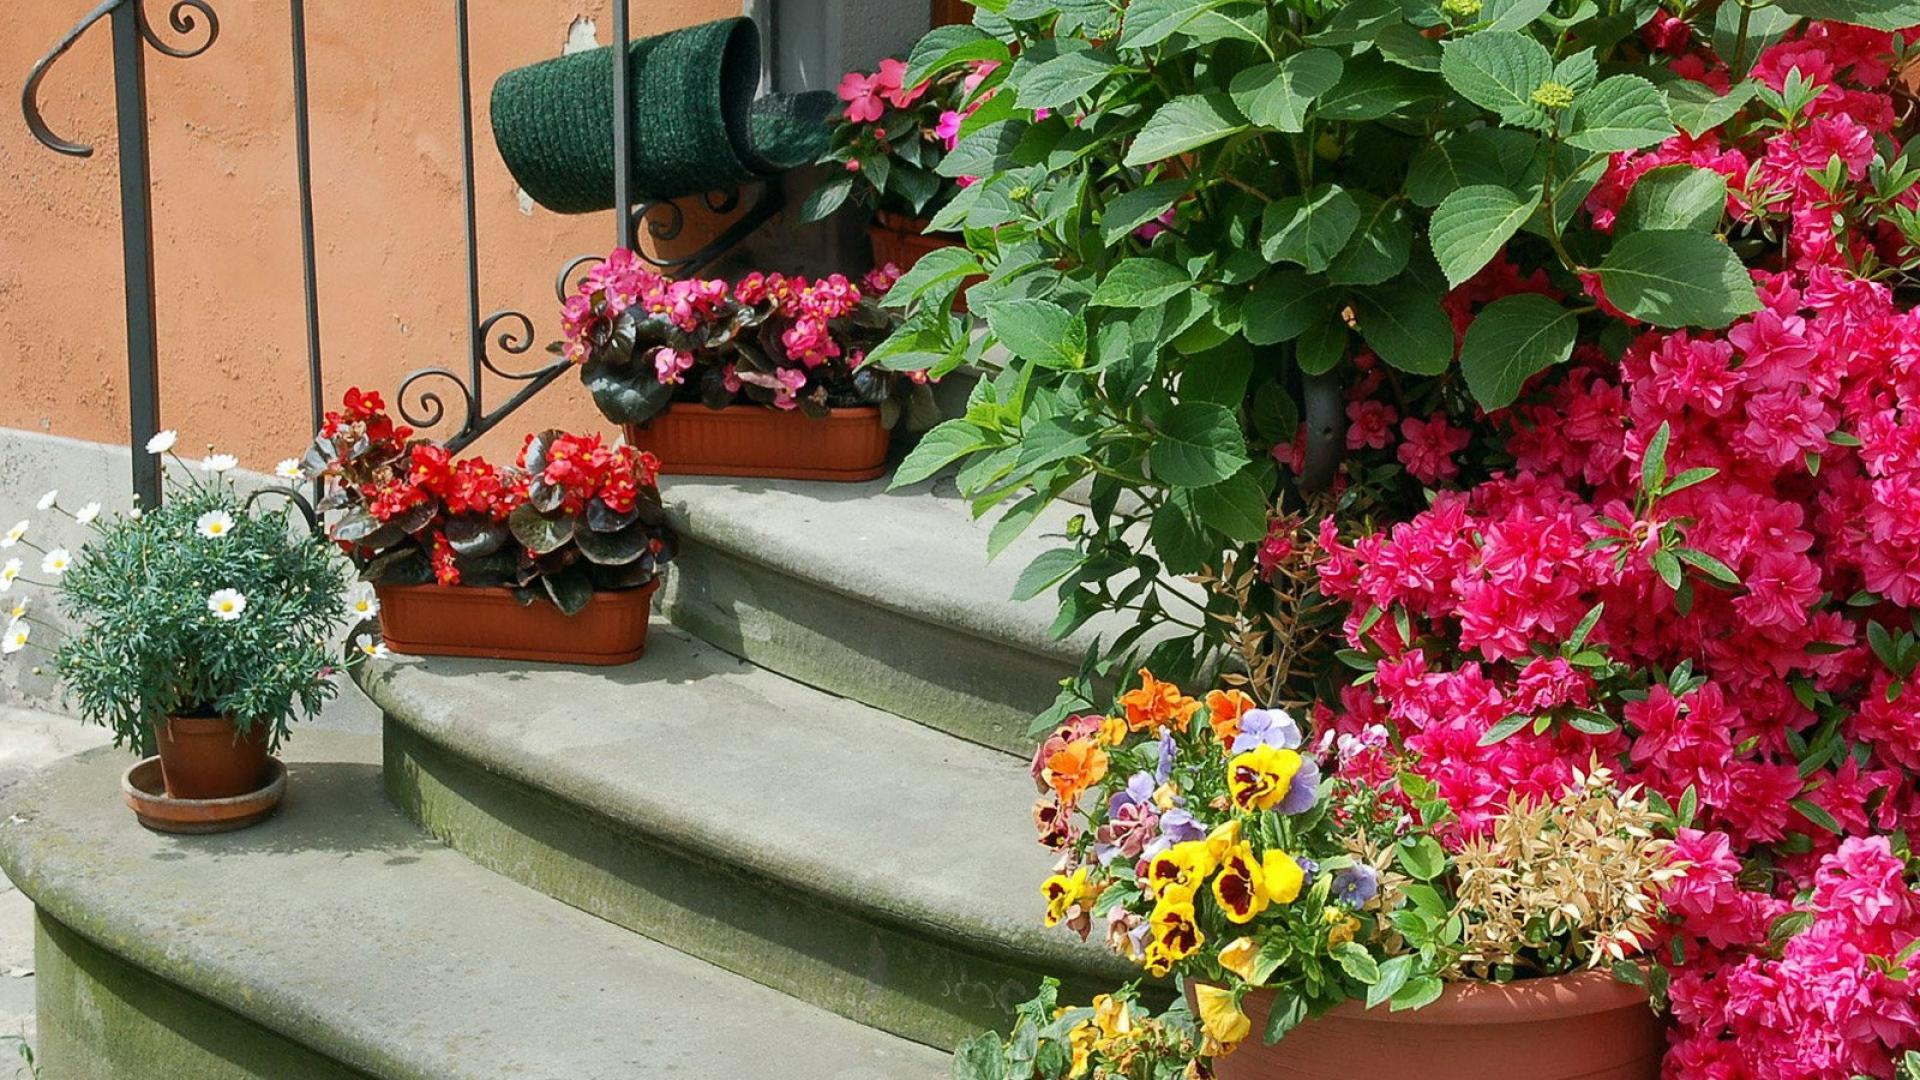 Download Wallpaper flowers pots herbs railings stairs